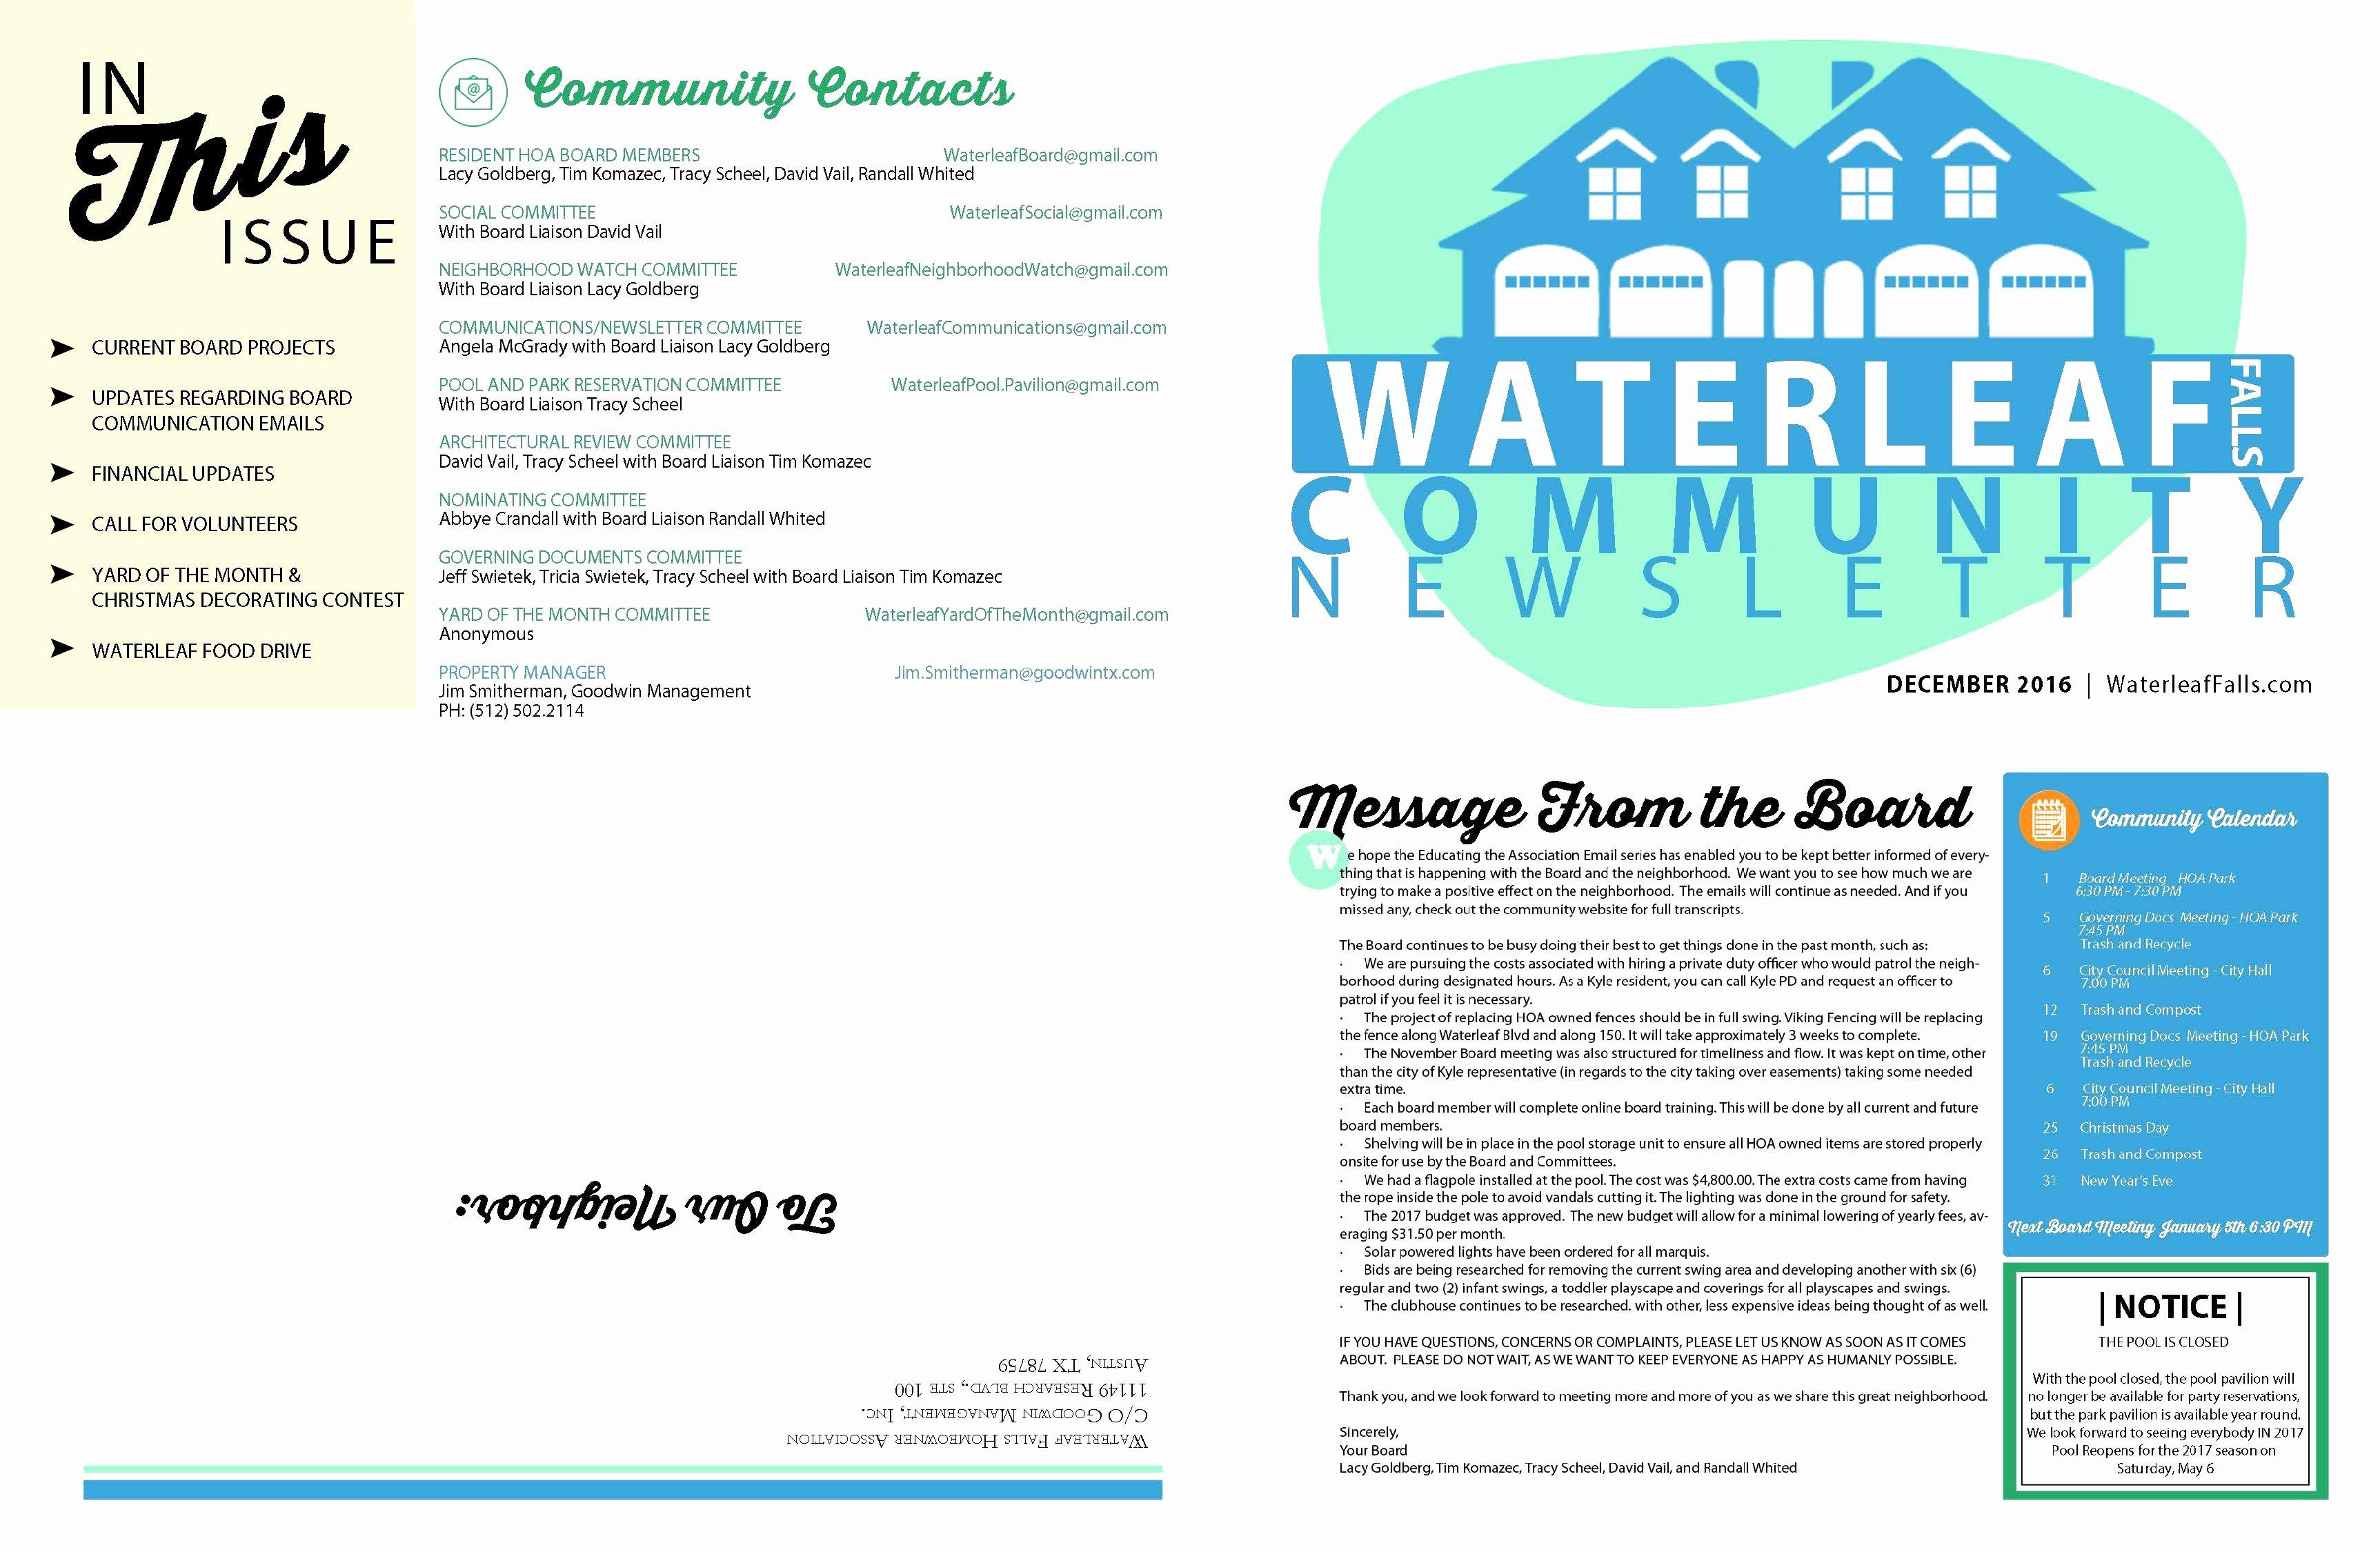 Homeowners association Newsletter Template Best Of Homeowners association Newsletter Template Epp Acpfo